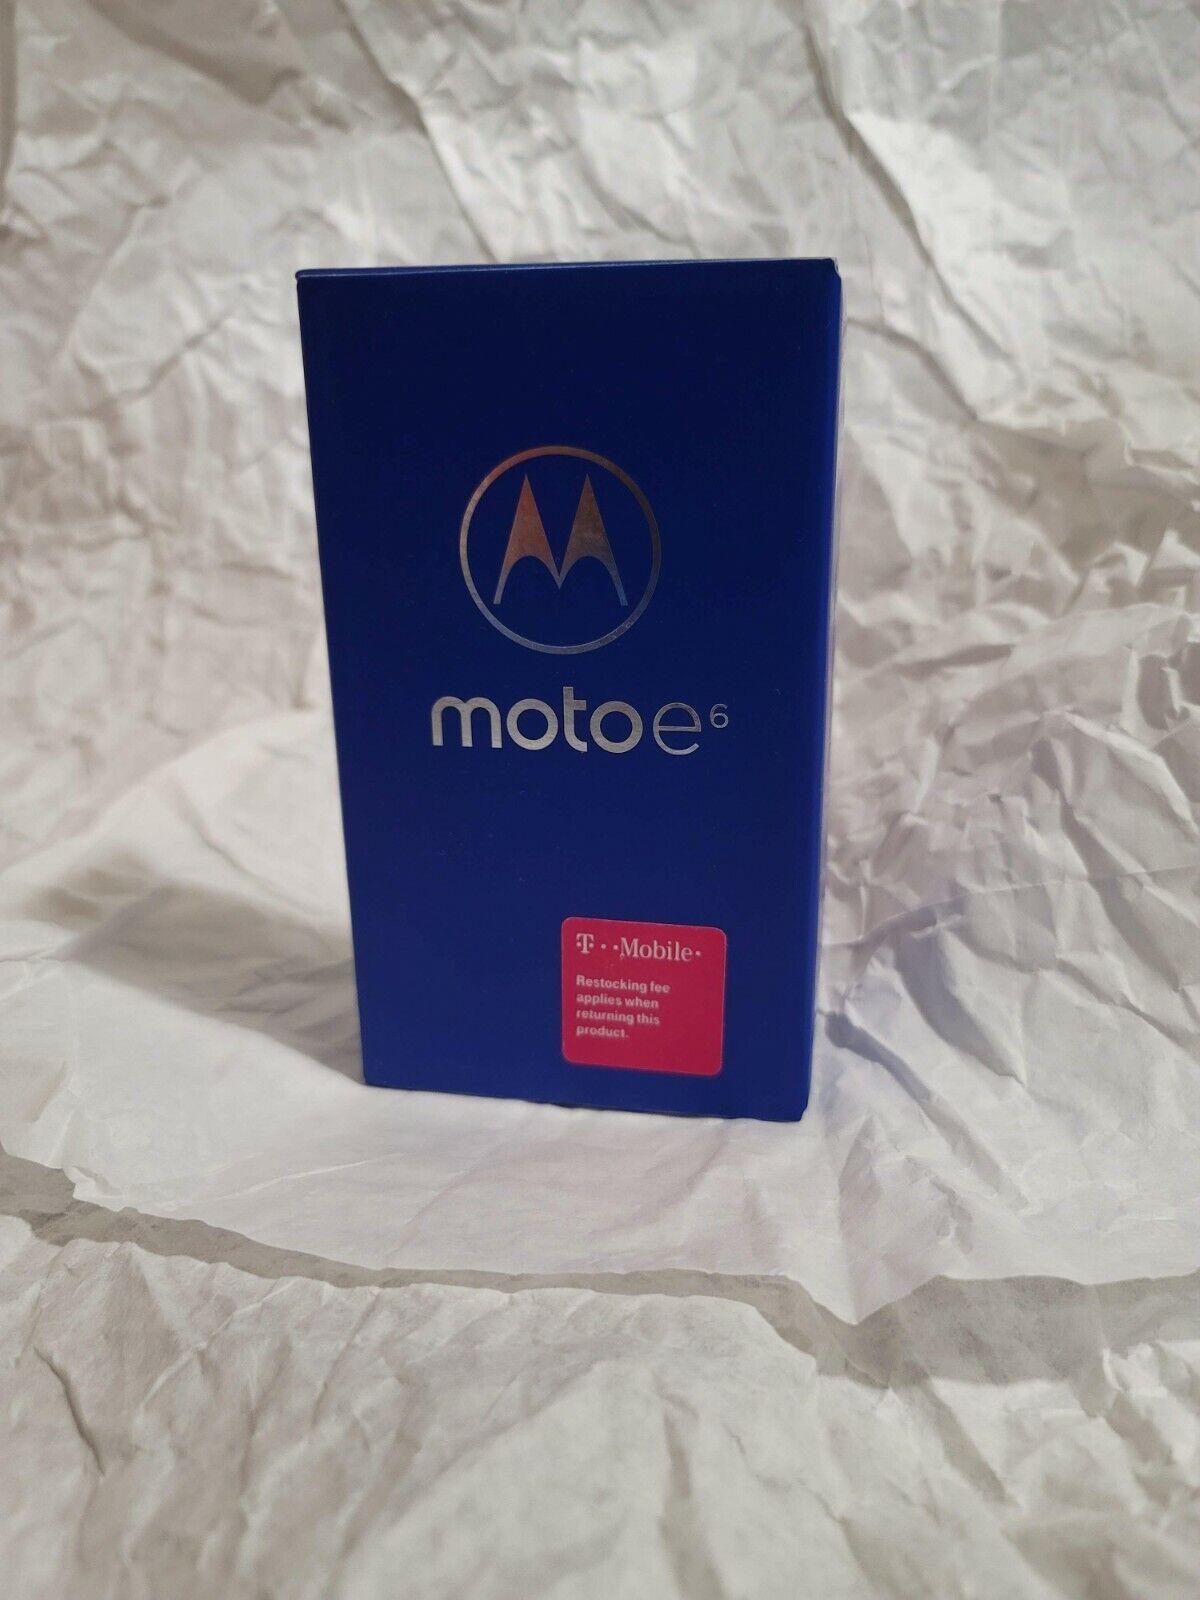 как выглядит T-Mobile Moto e6 16GB smartphone фото